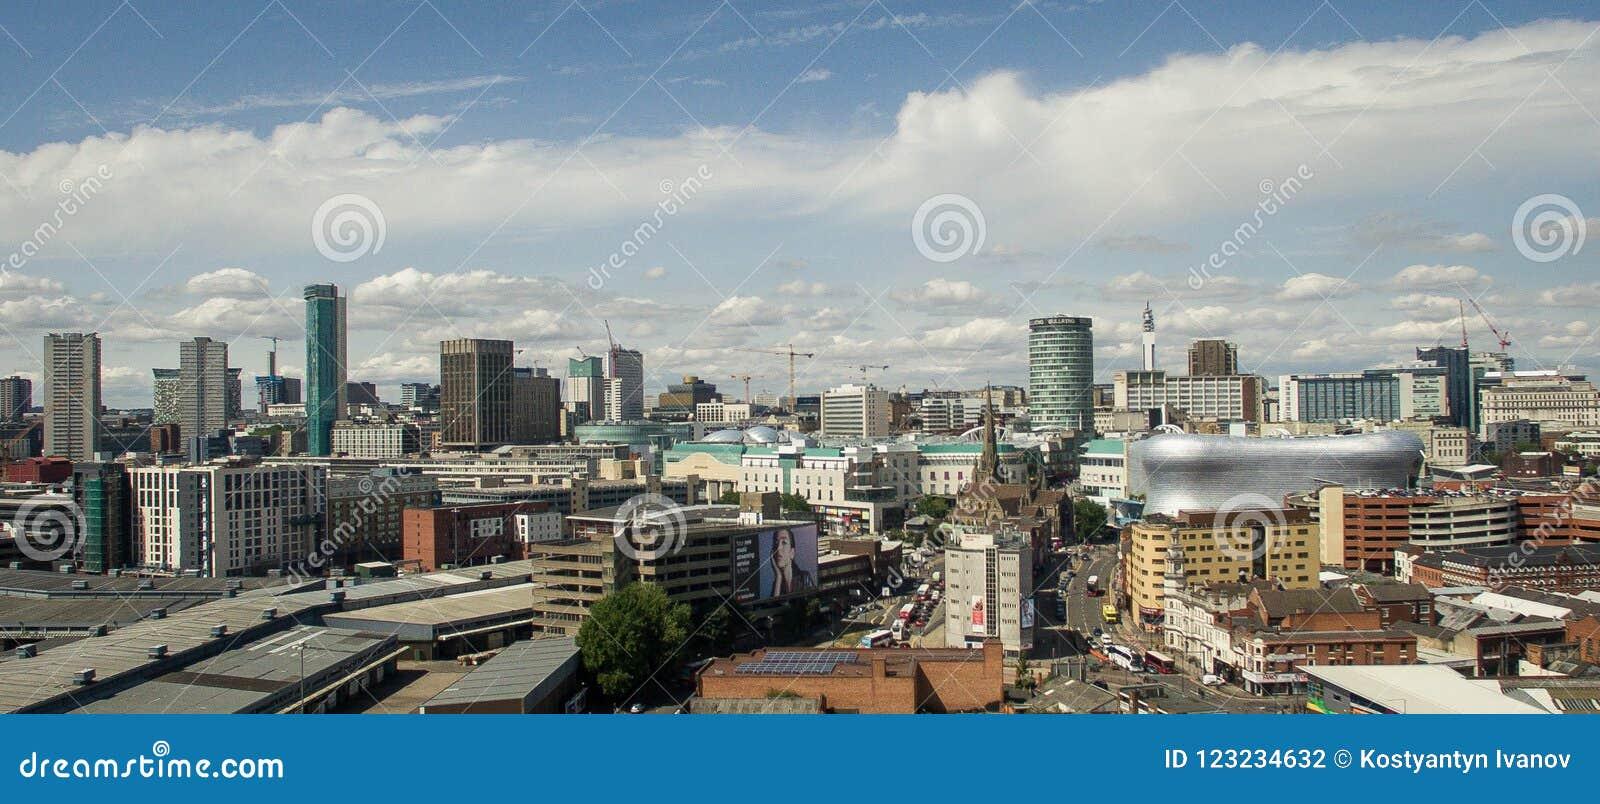 Фото Бирмингема, Великобритании сделало трутнем